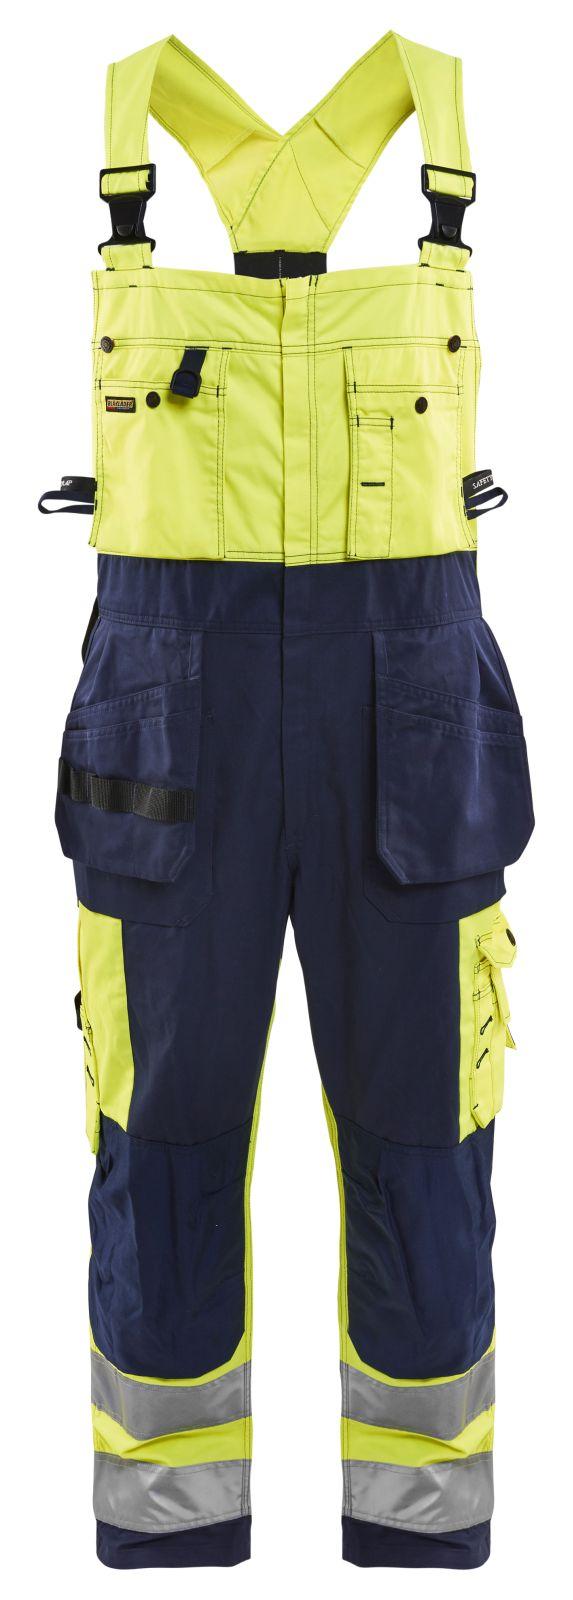 Blaklader Amerikaanse overalls 26031860 High Vis geel-marineblauw(3389)